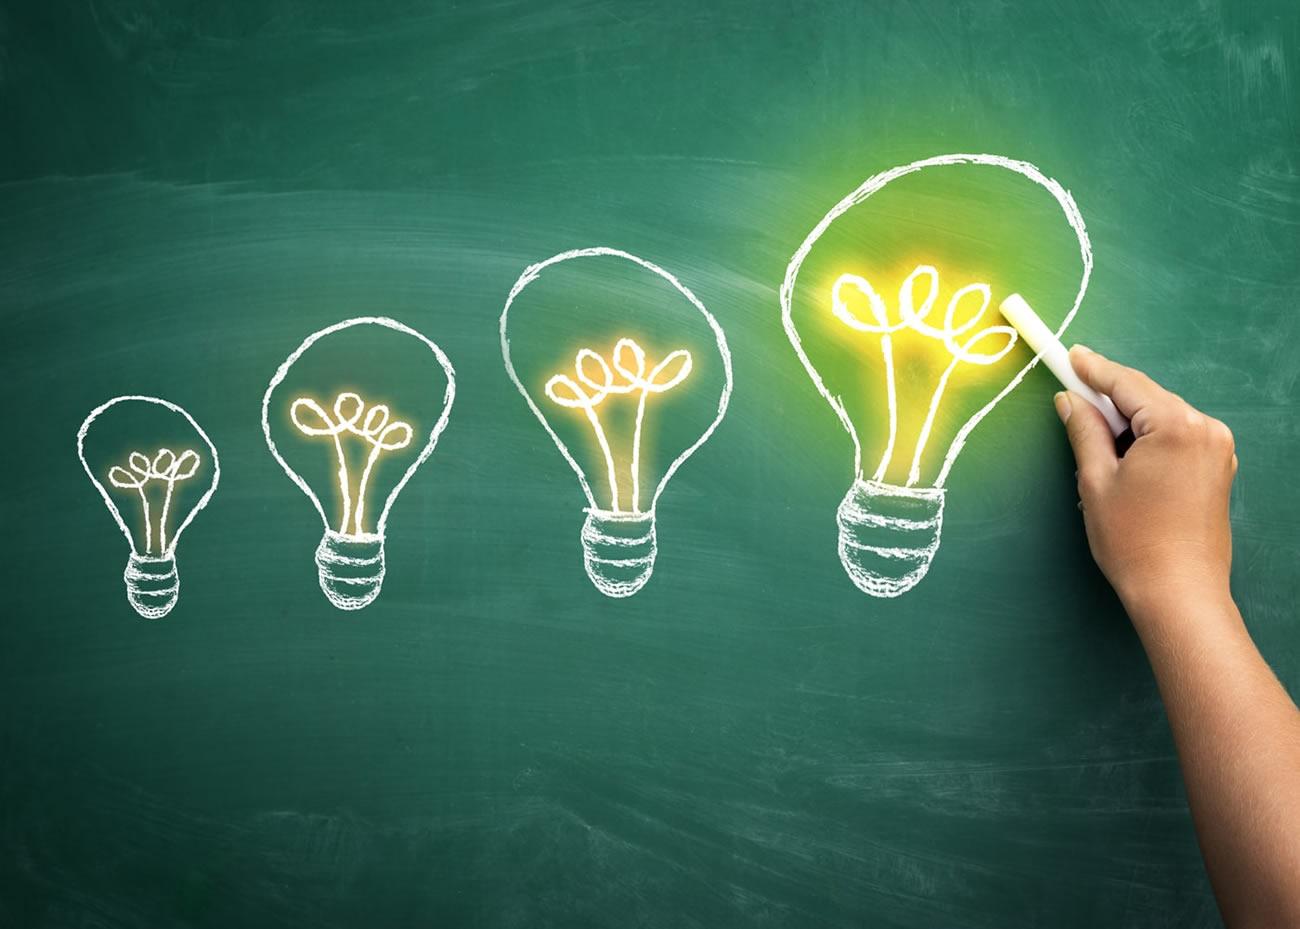 naem-2018-blog-small-big-idea-concept-how-become-700x500